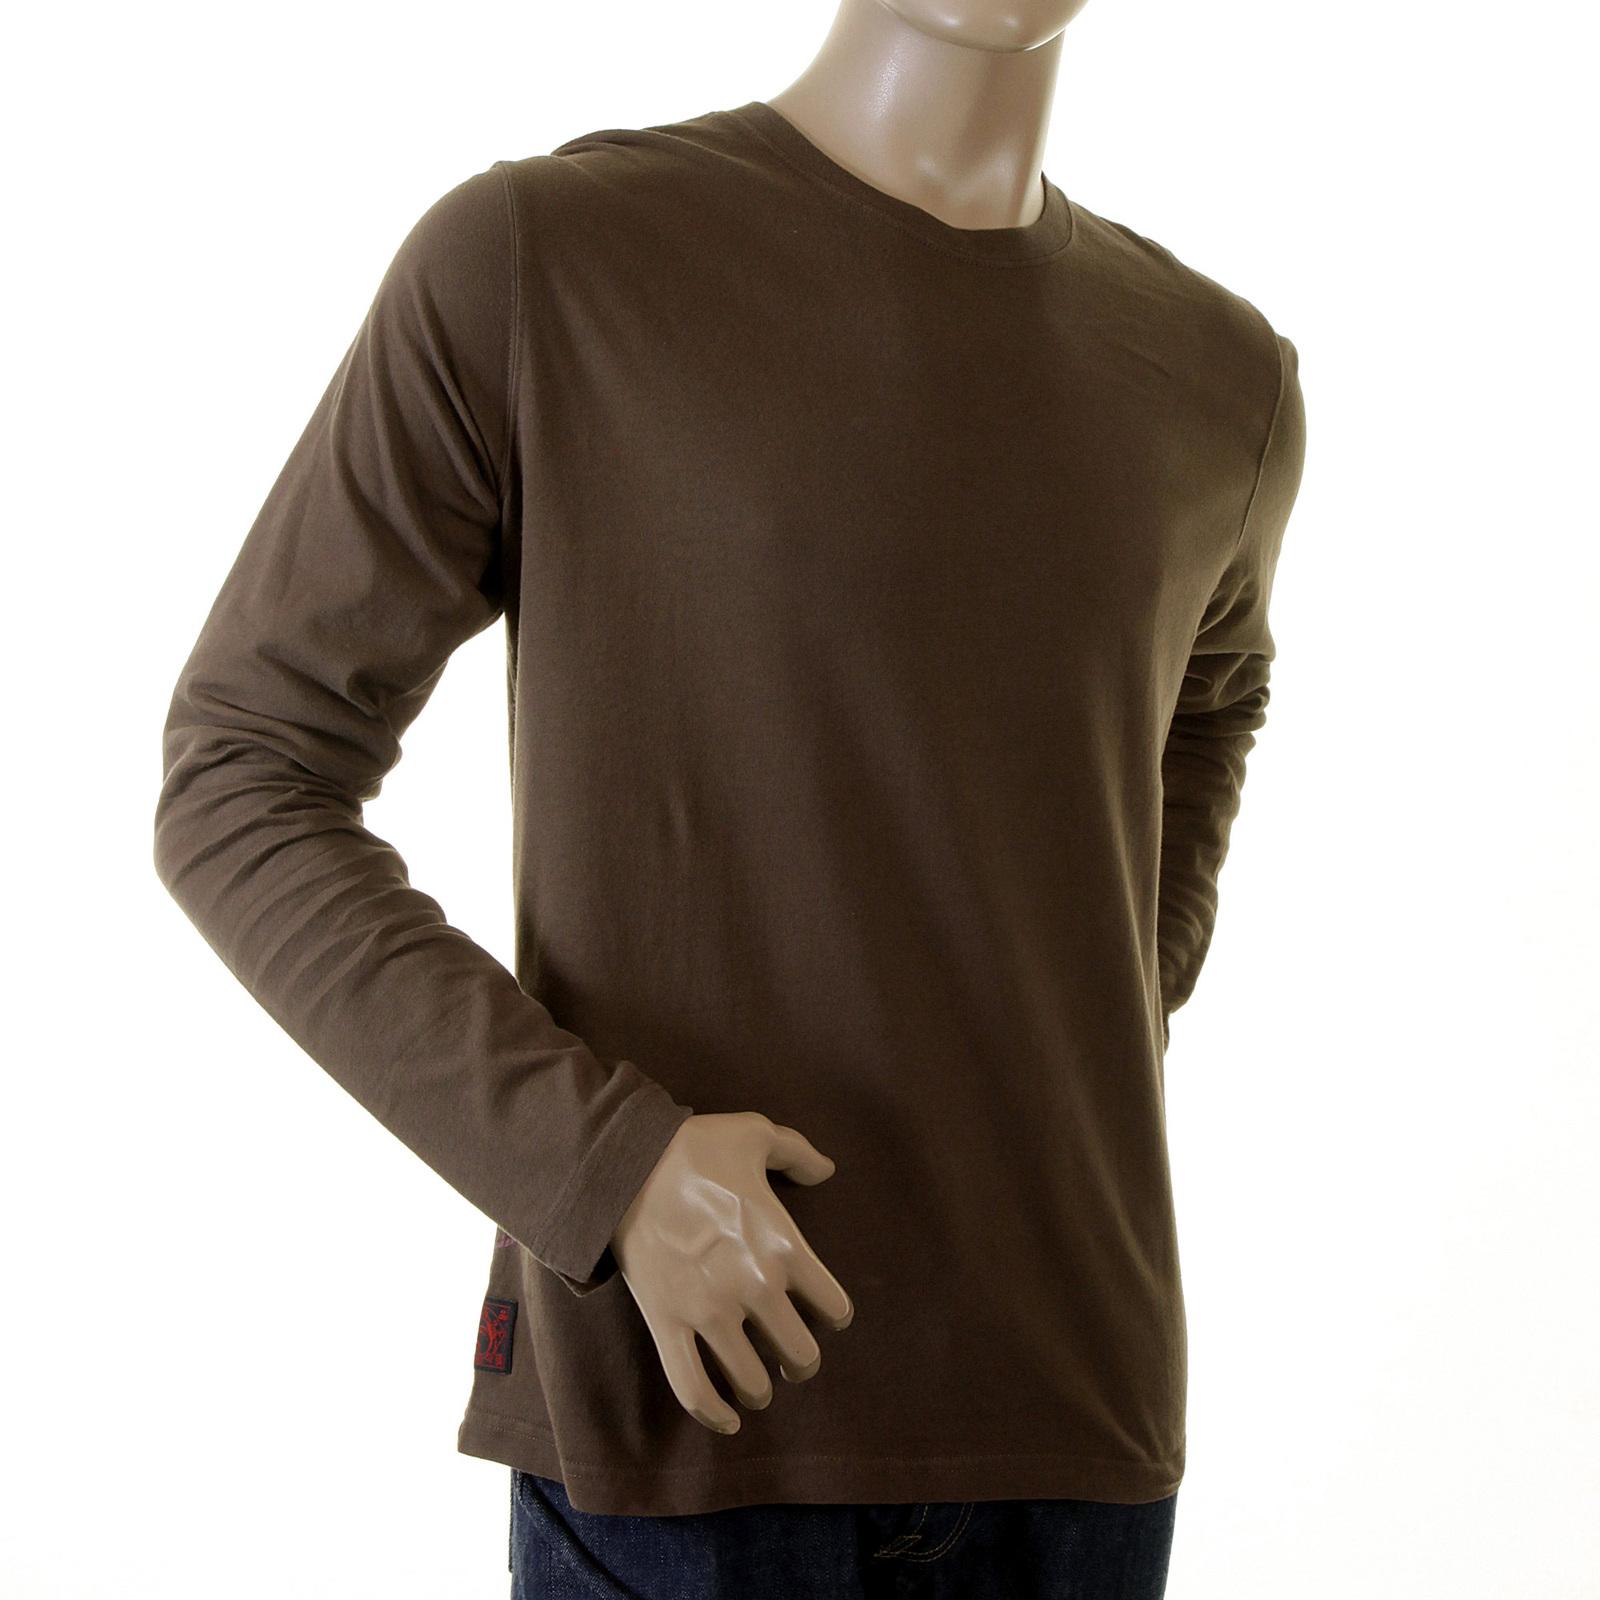 594ee7ea74 Evisu Genuine Mens Chocolate Brown Regular Fit Long Sleeve Crew Neck T Shirt  with Evisu Maniacs